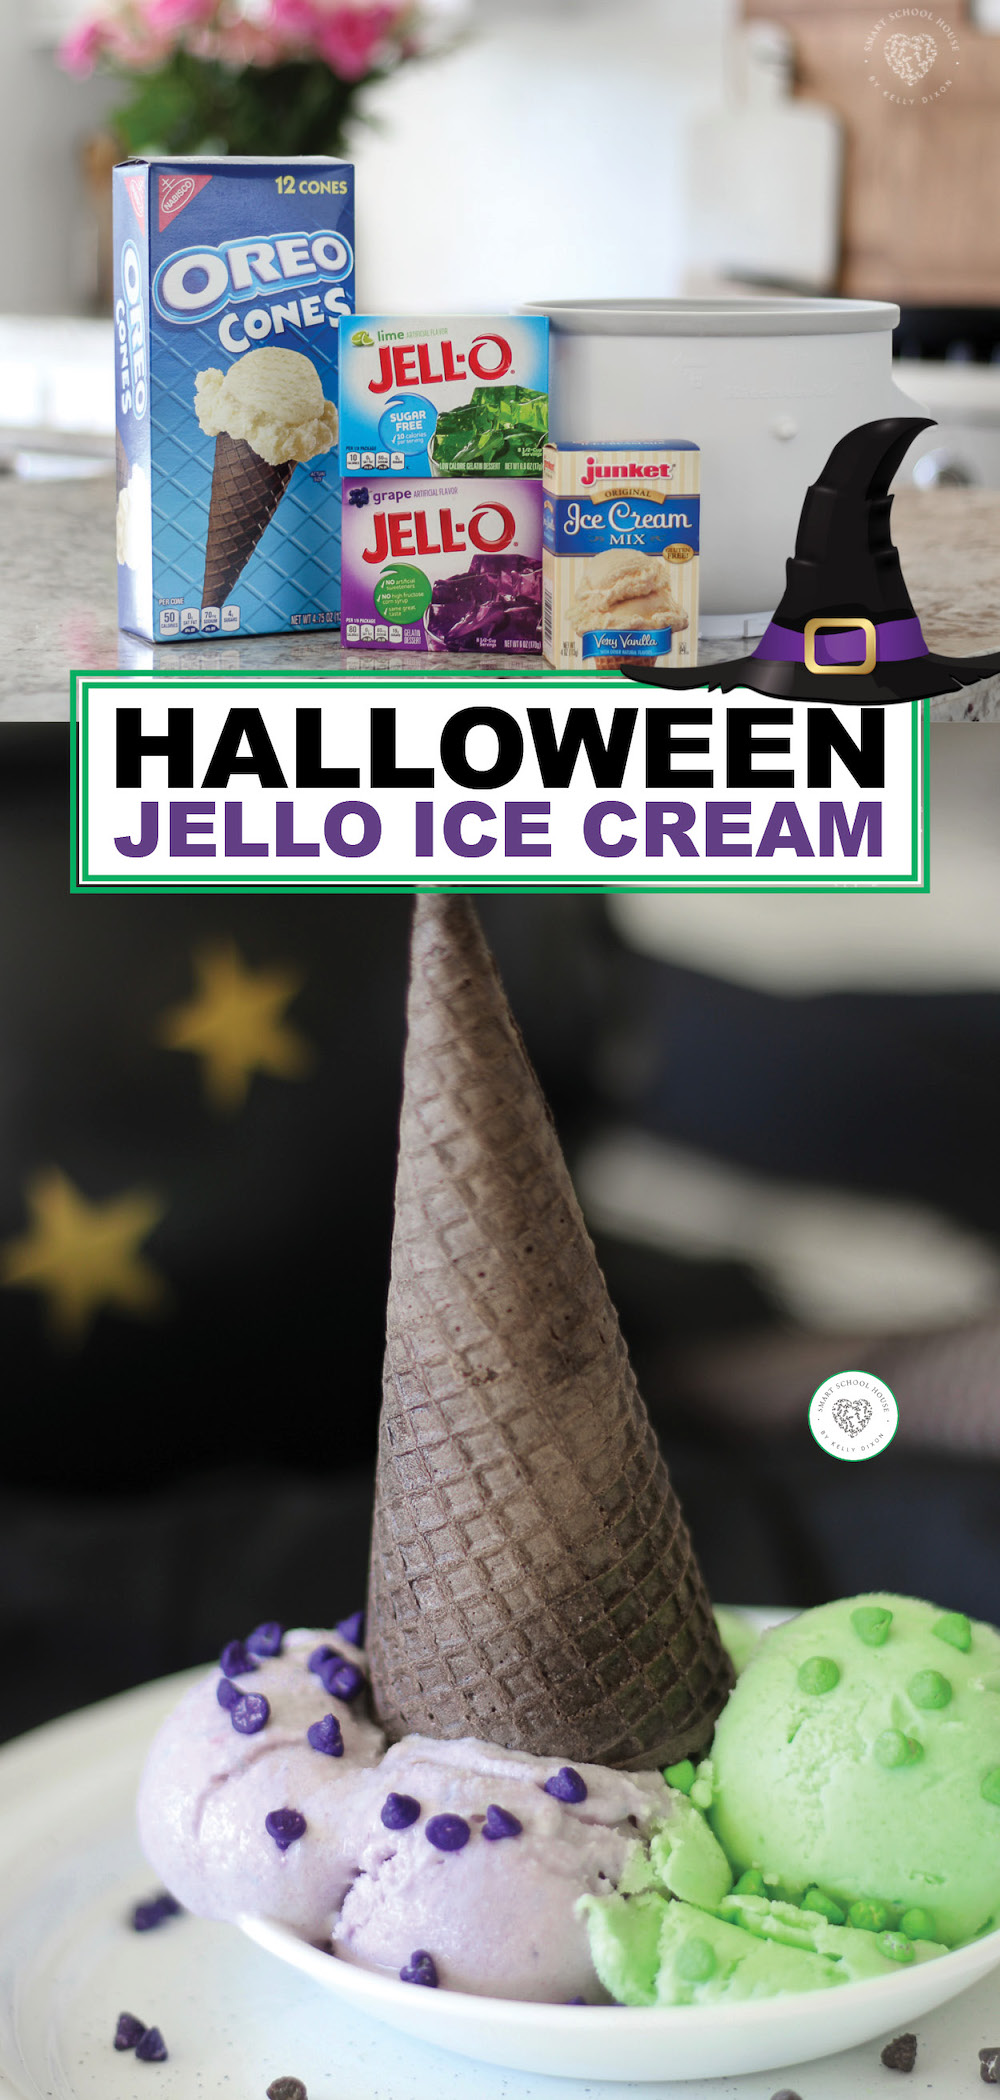 Halloween Jello Ice Cream